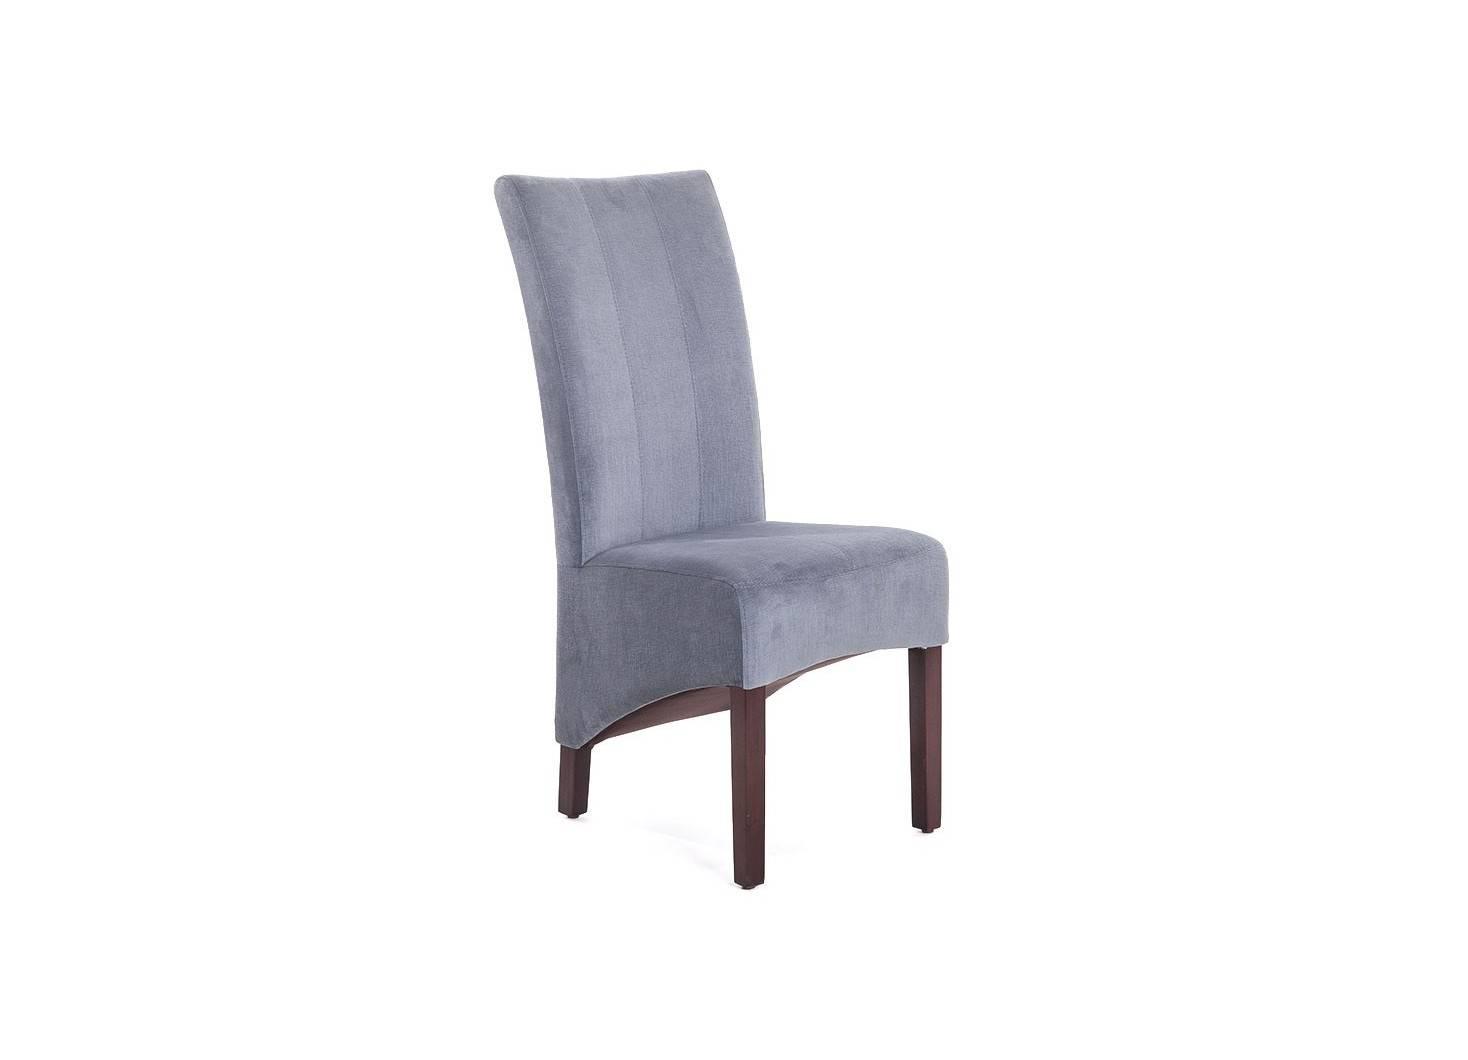 Chaise Bovary en velours microfibre gris